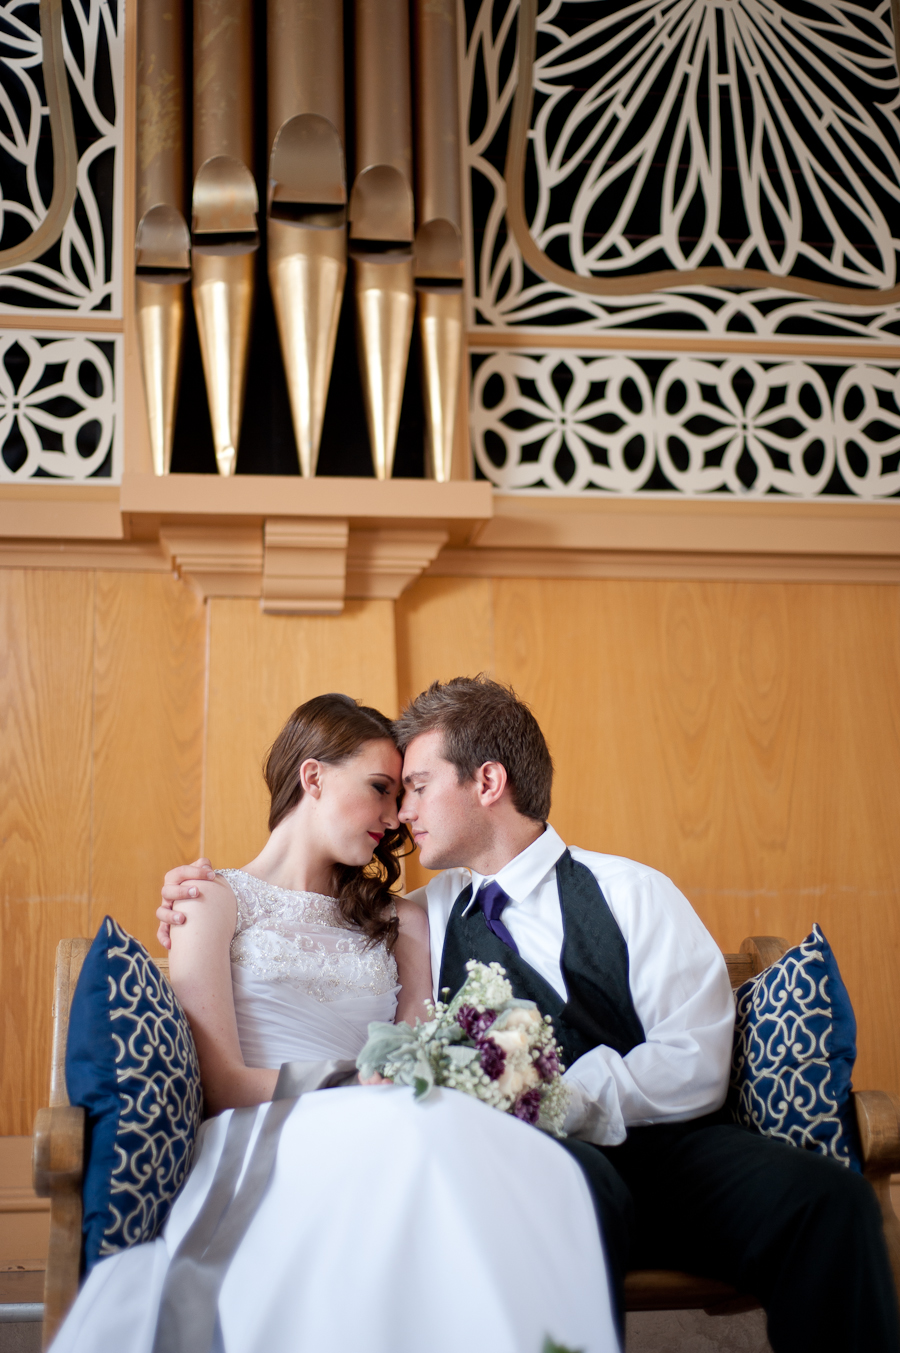 Susannah_Deangelo_Antique_Silver_Music_Hall_Wedding-25.jpg